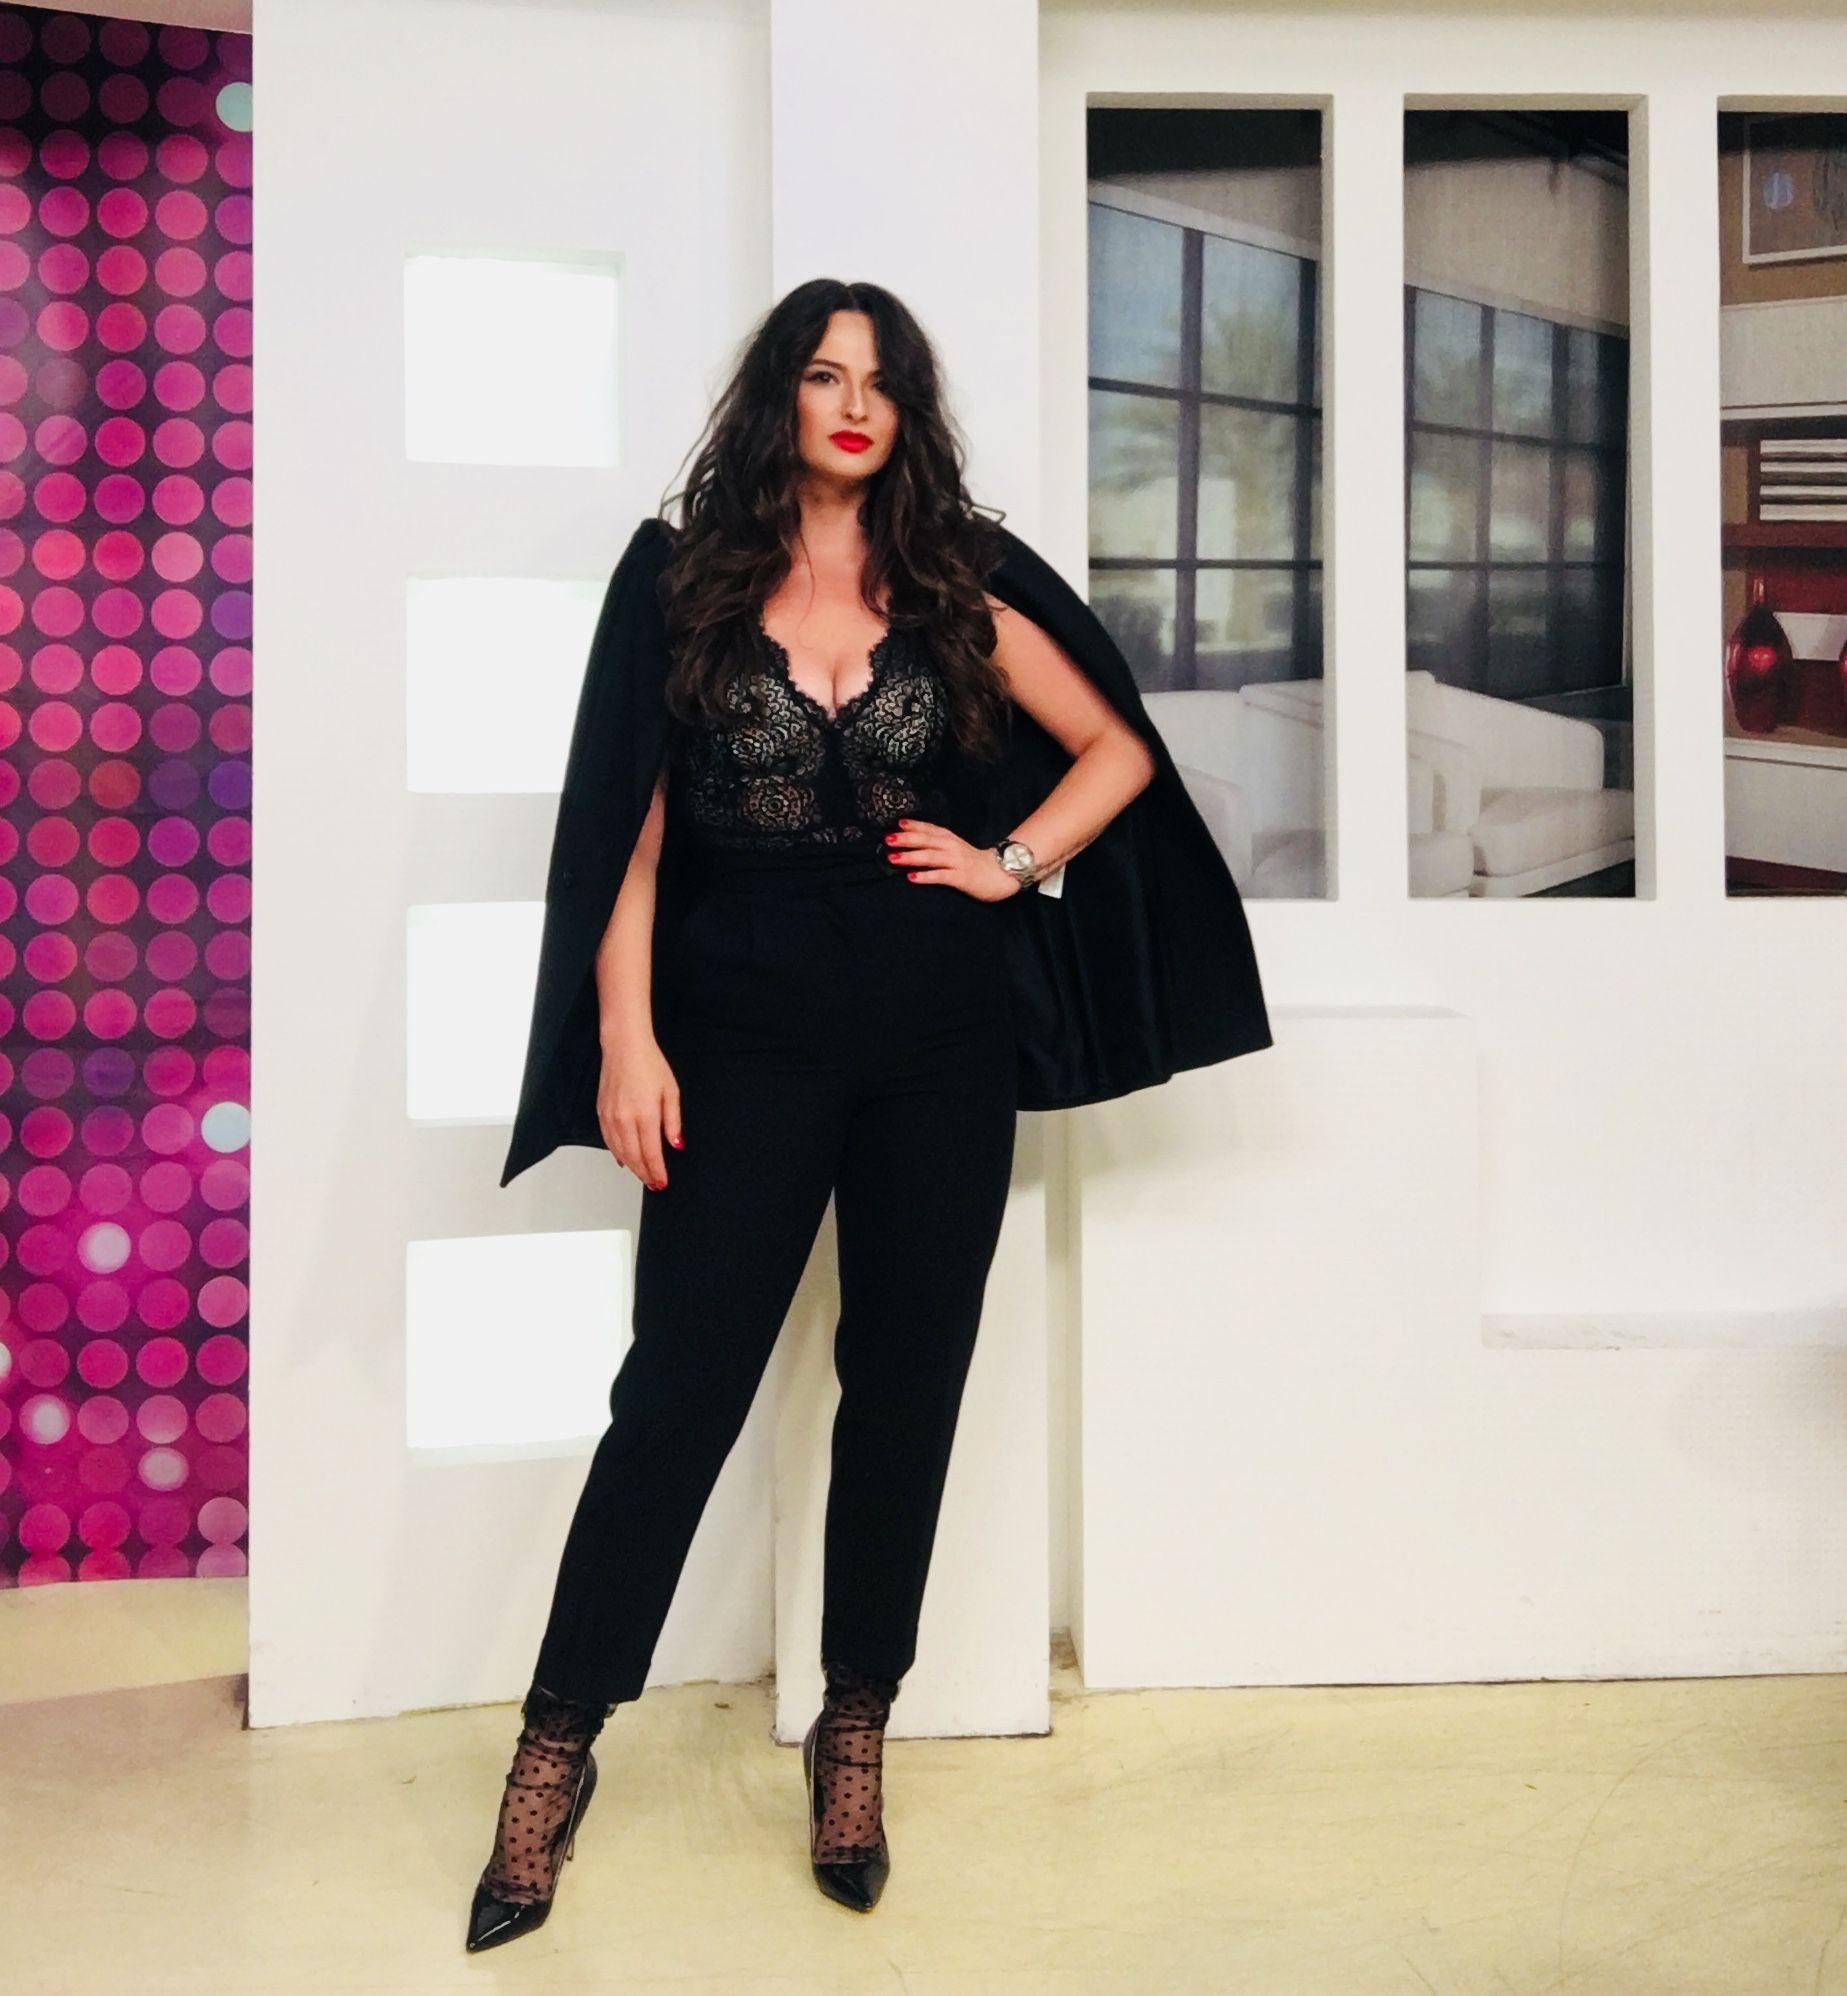 Sunati La 1204 Pentru A Fi In Direct La Castigati Acum La Etno Tv Adelalupse Friday Show Tv Tvshow Live Evening Tv Presenters Style Tv Host